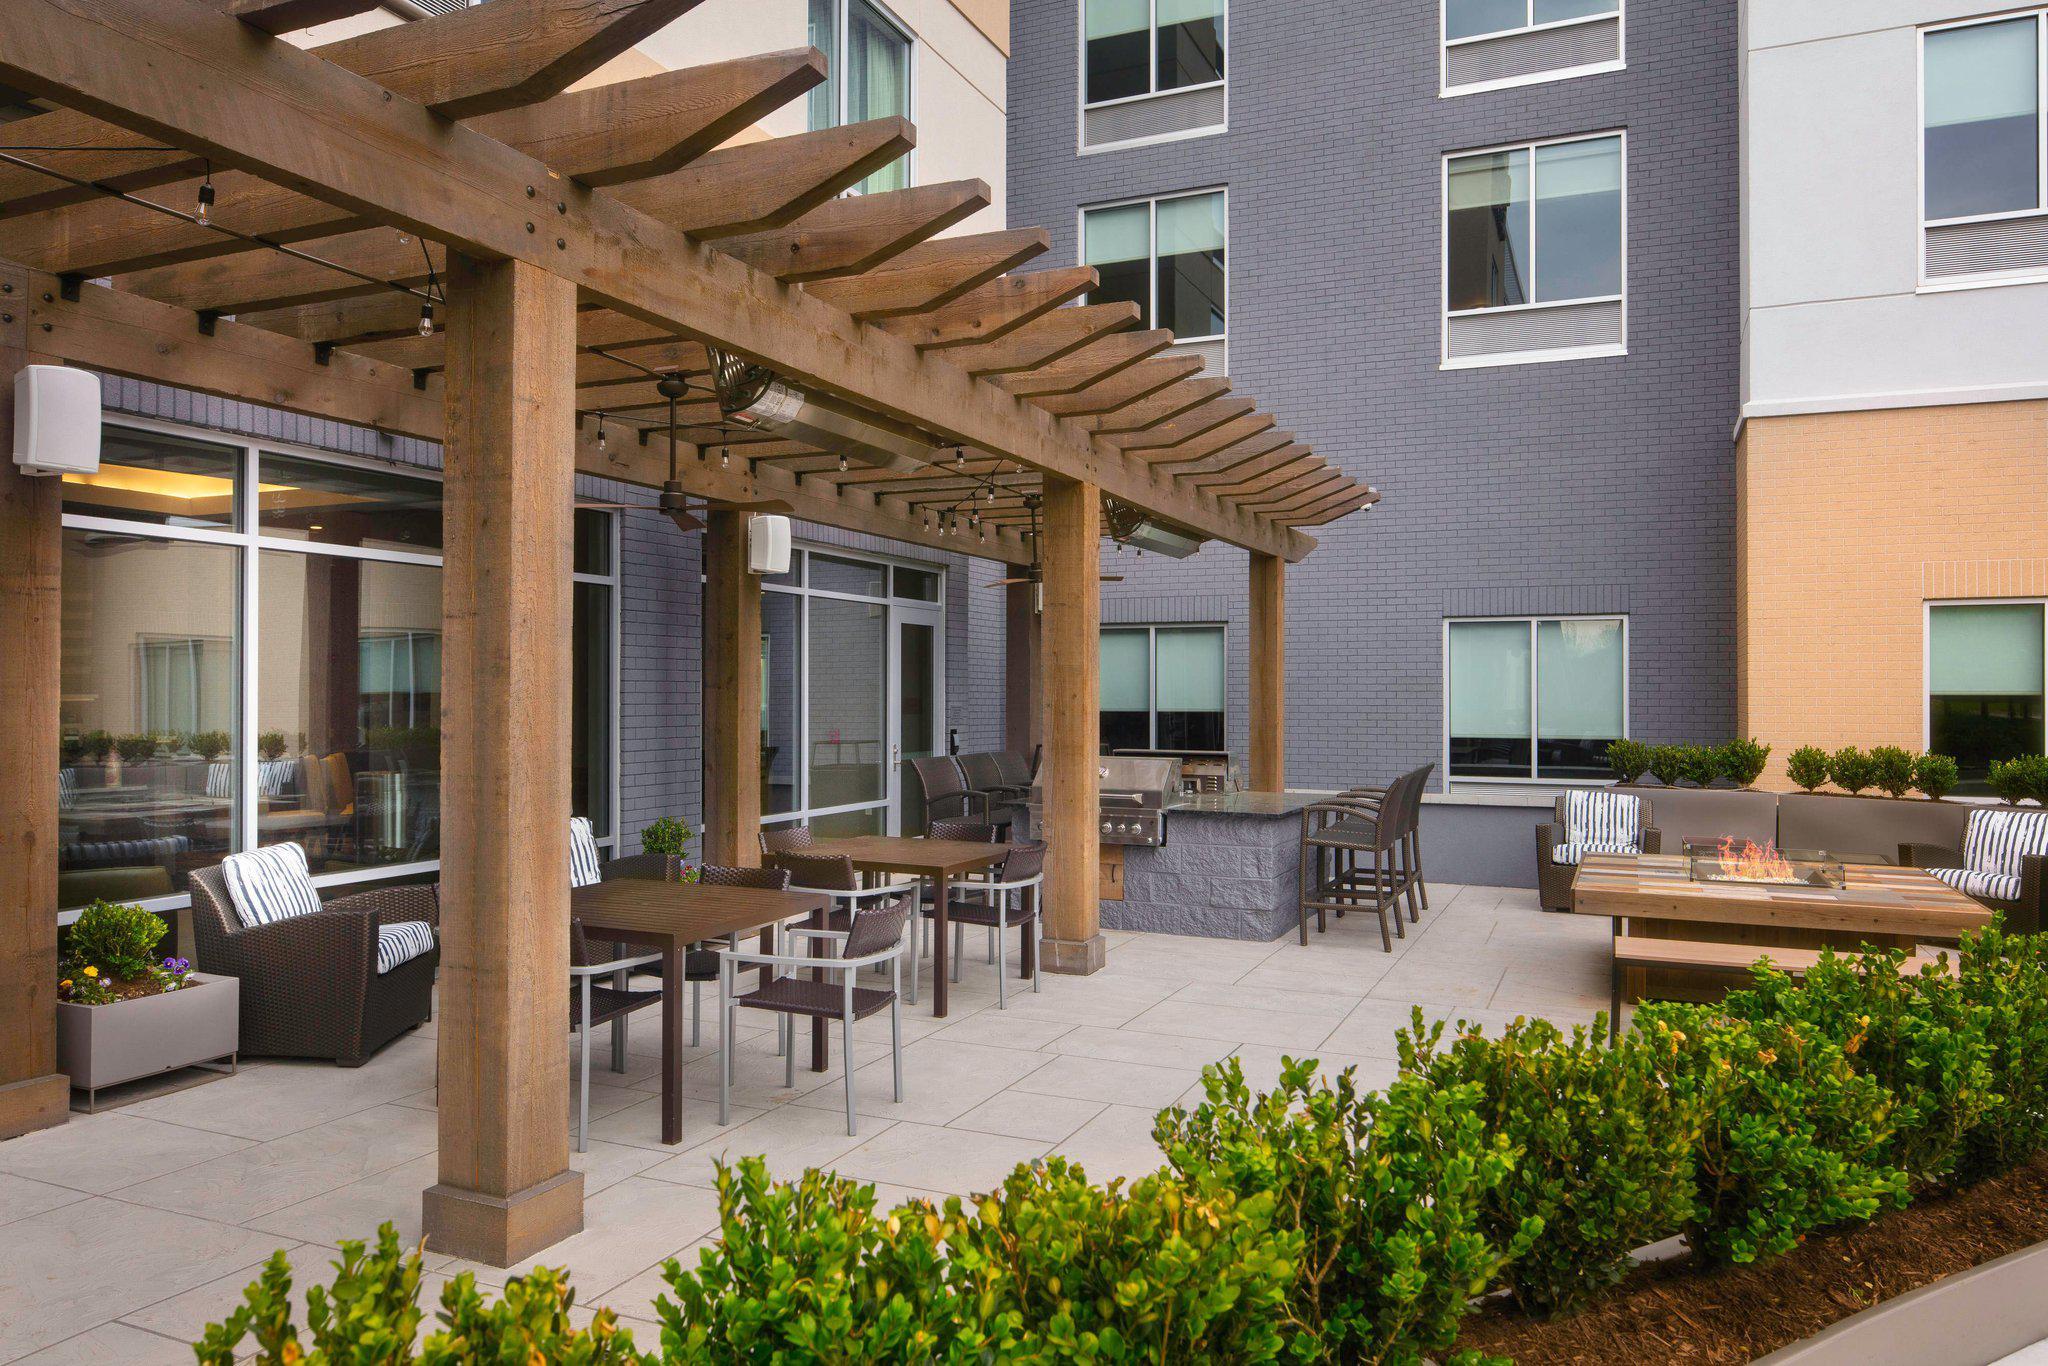 Fairfield Inn & Suites by Marriott Louisville Northeast